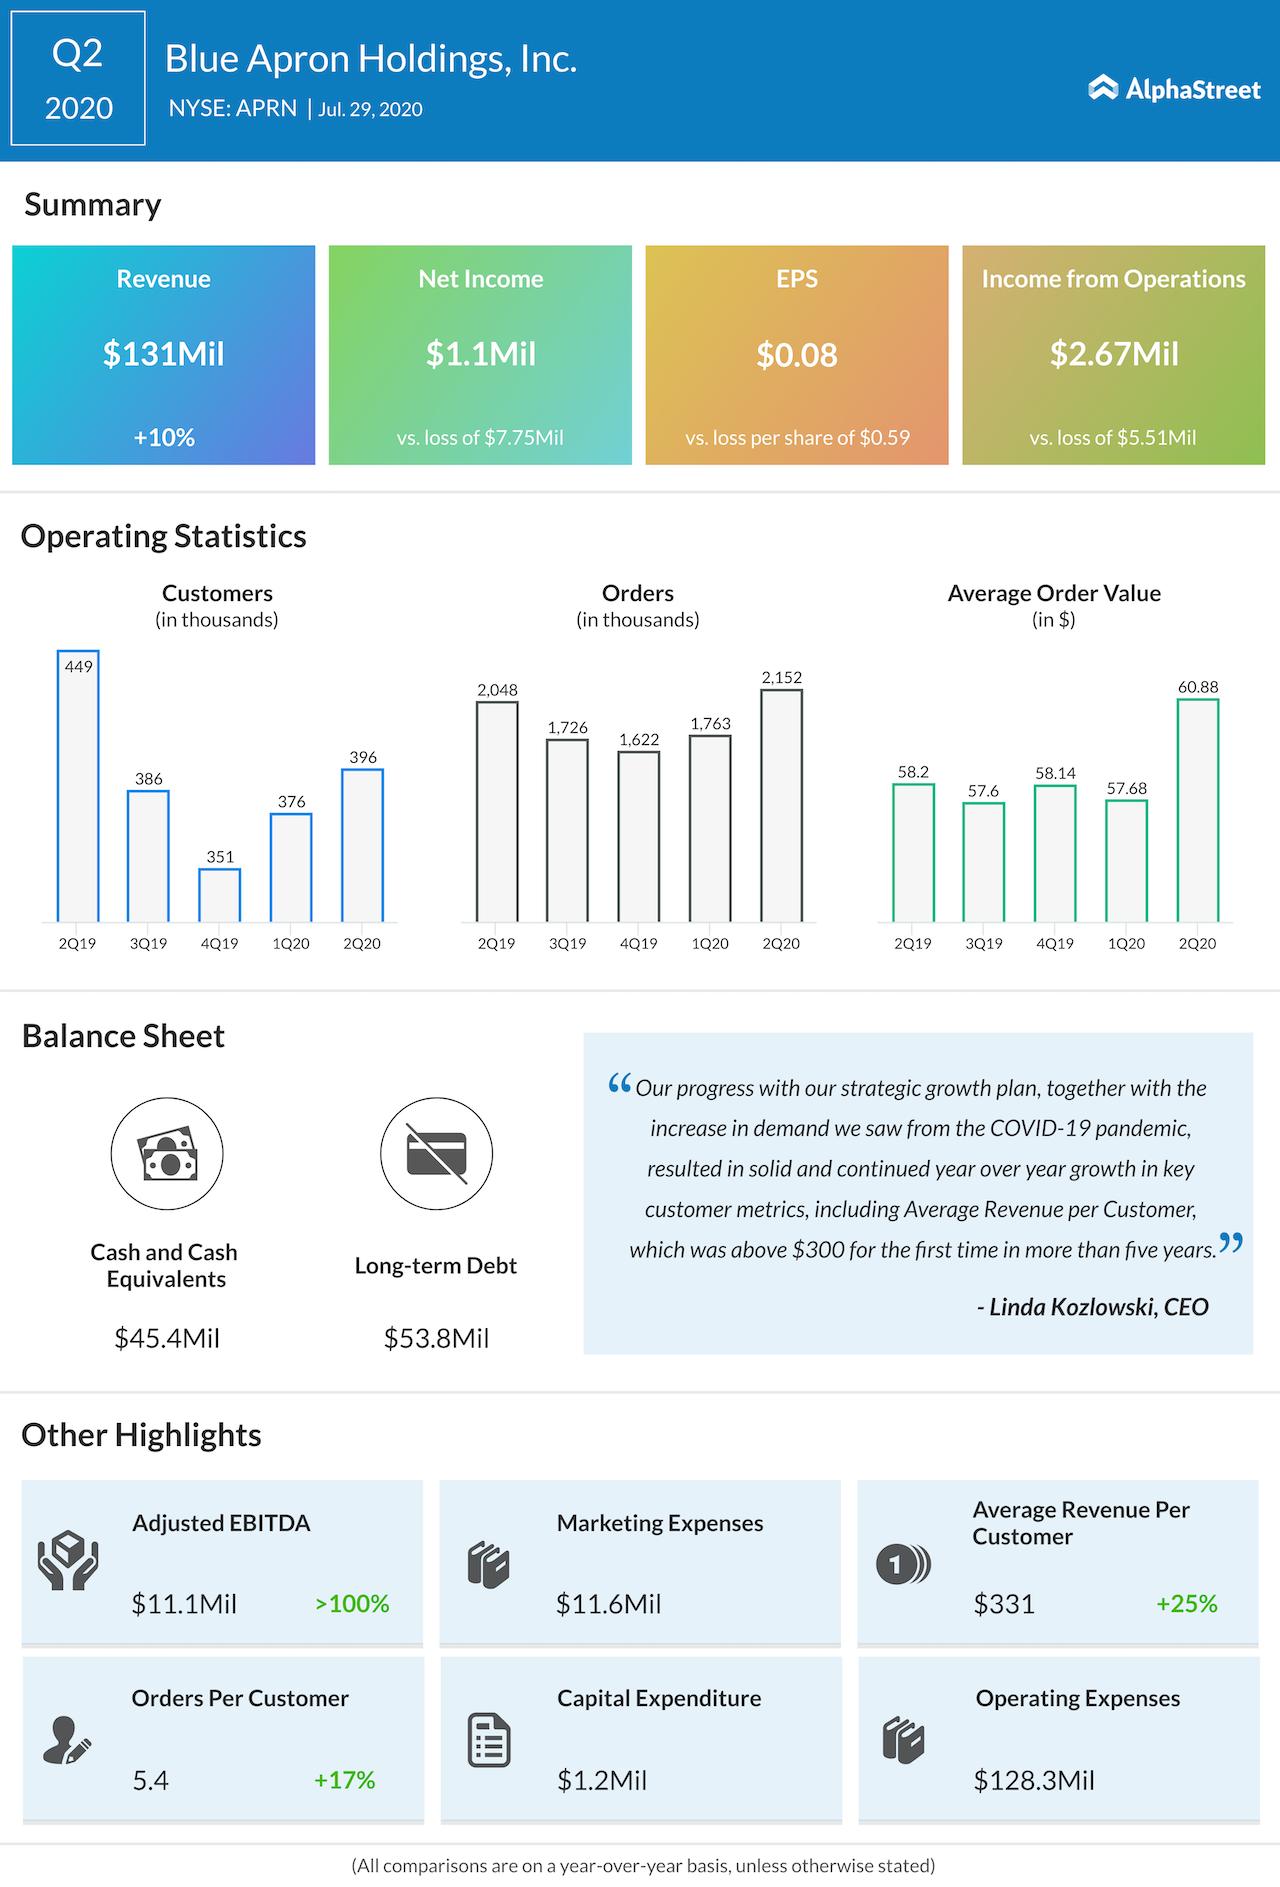 Blue Apron Holdings Q2 2020 earnings